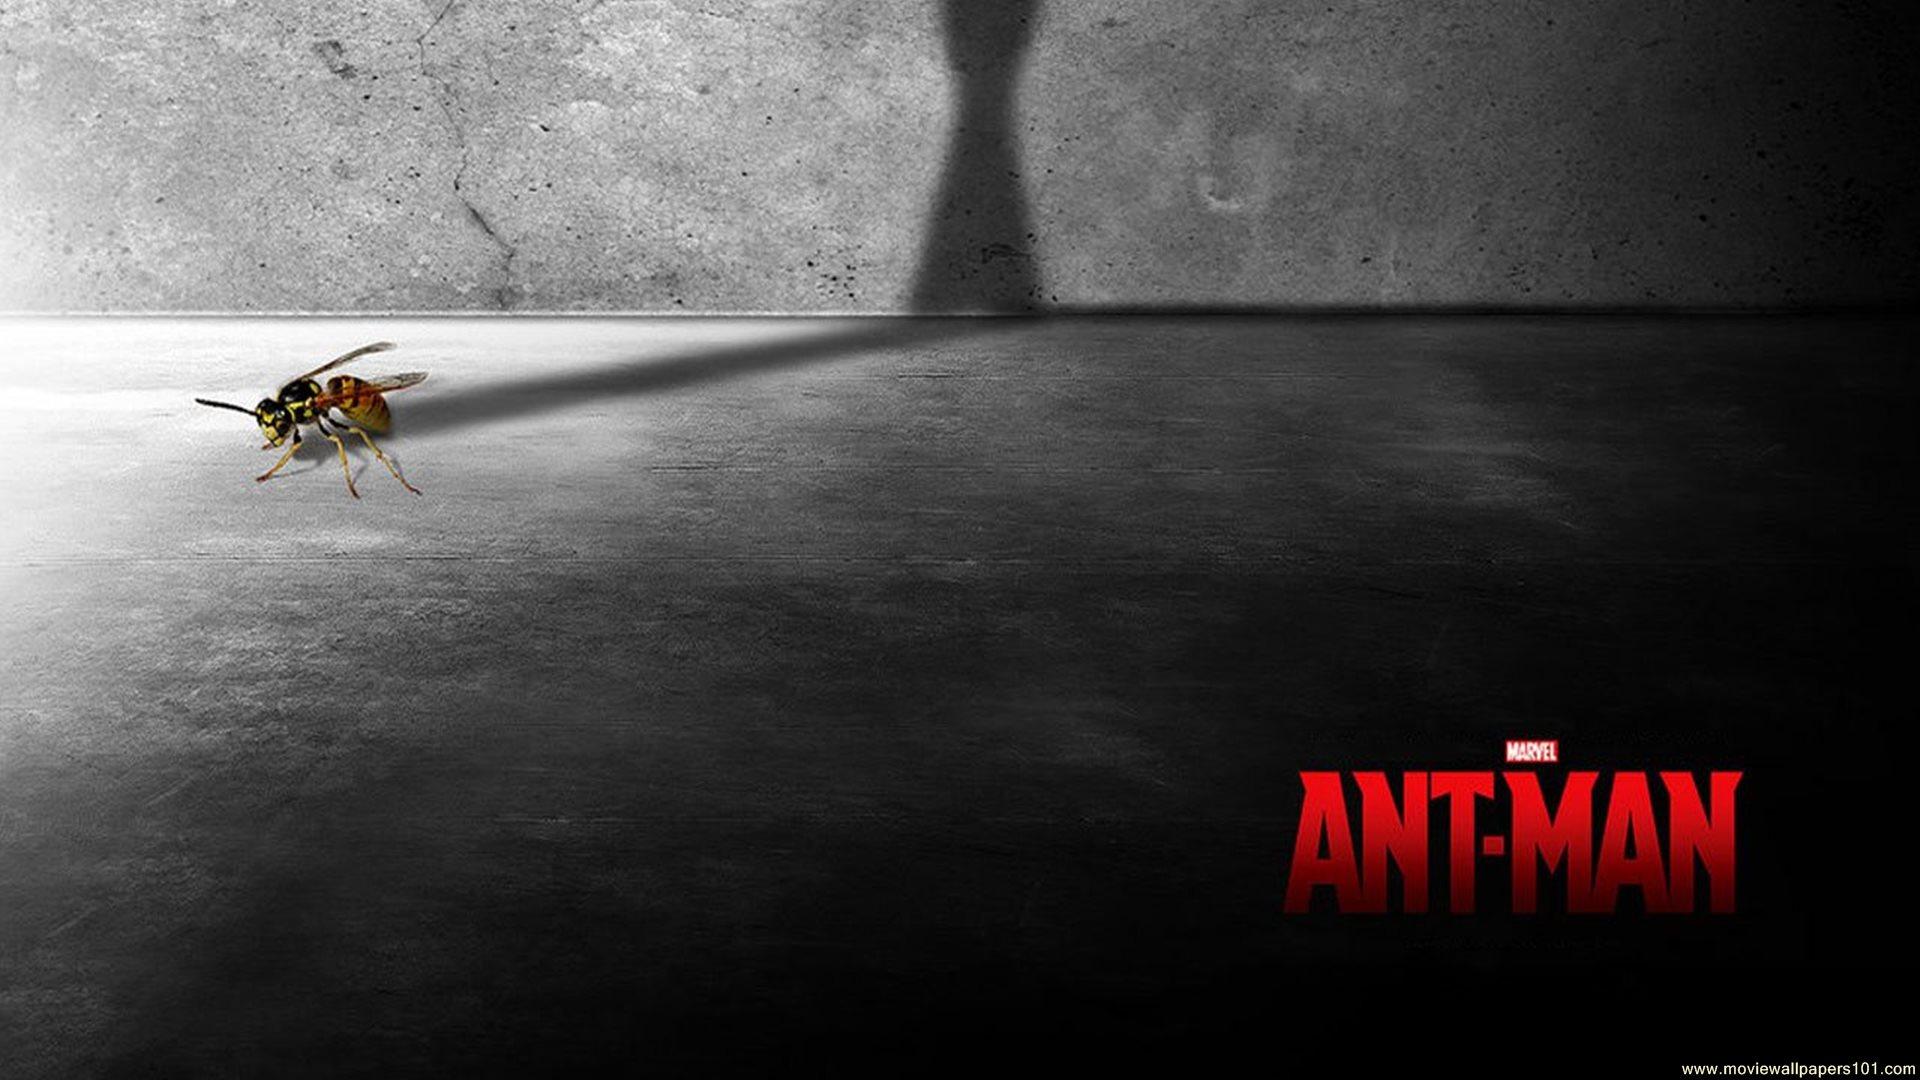 Ant Man Retina Movie Wallpaper: Ant Man Movie Wallpaper